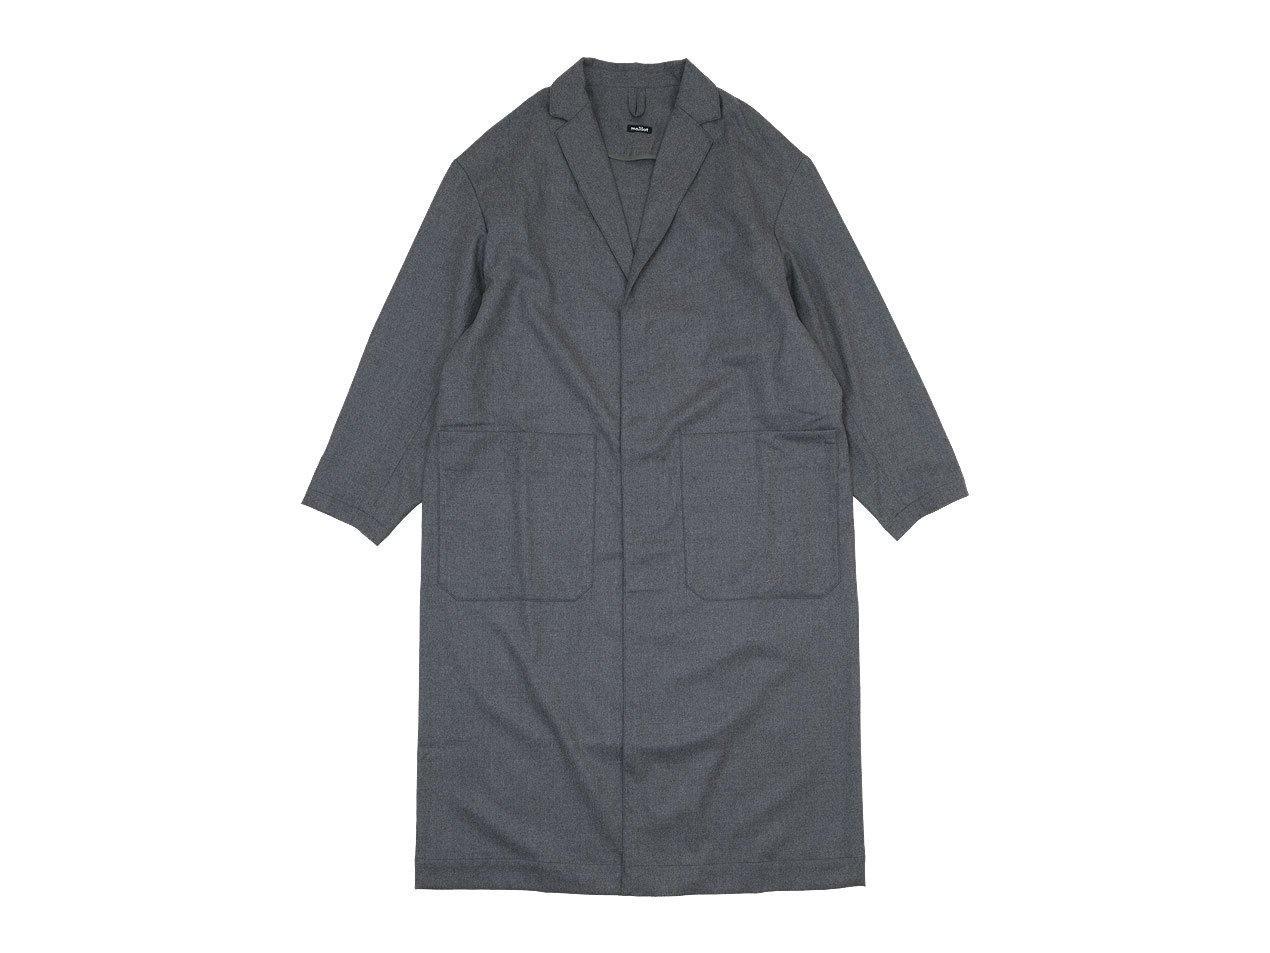 maillot mature wool labo coat GRAY